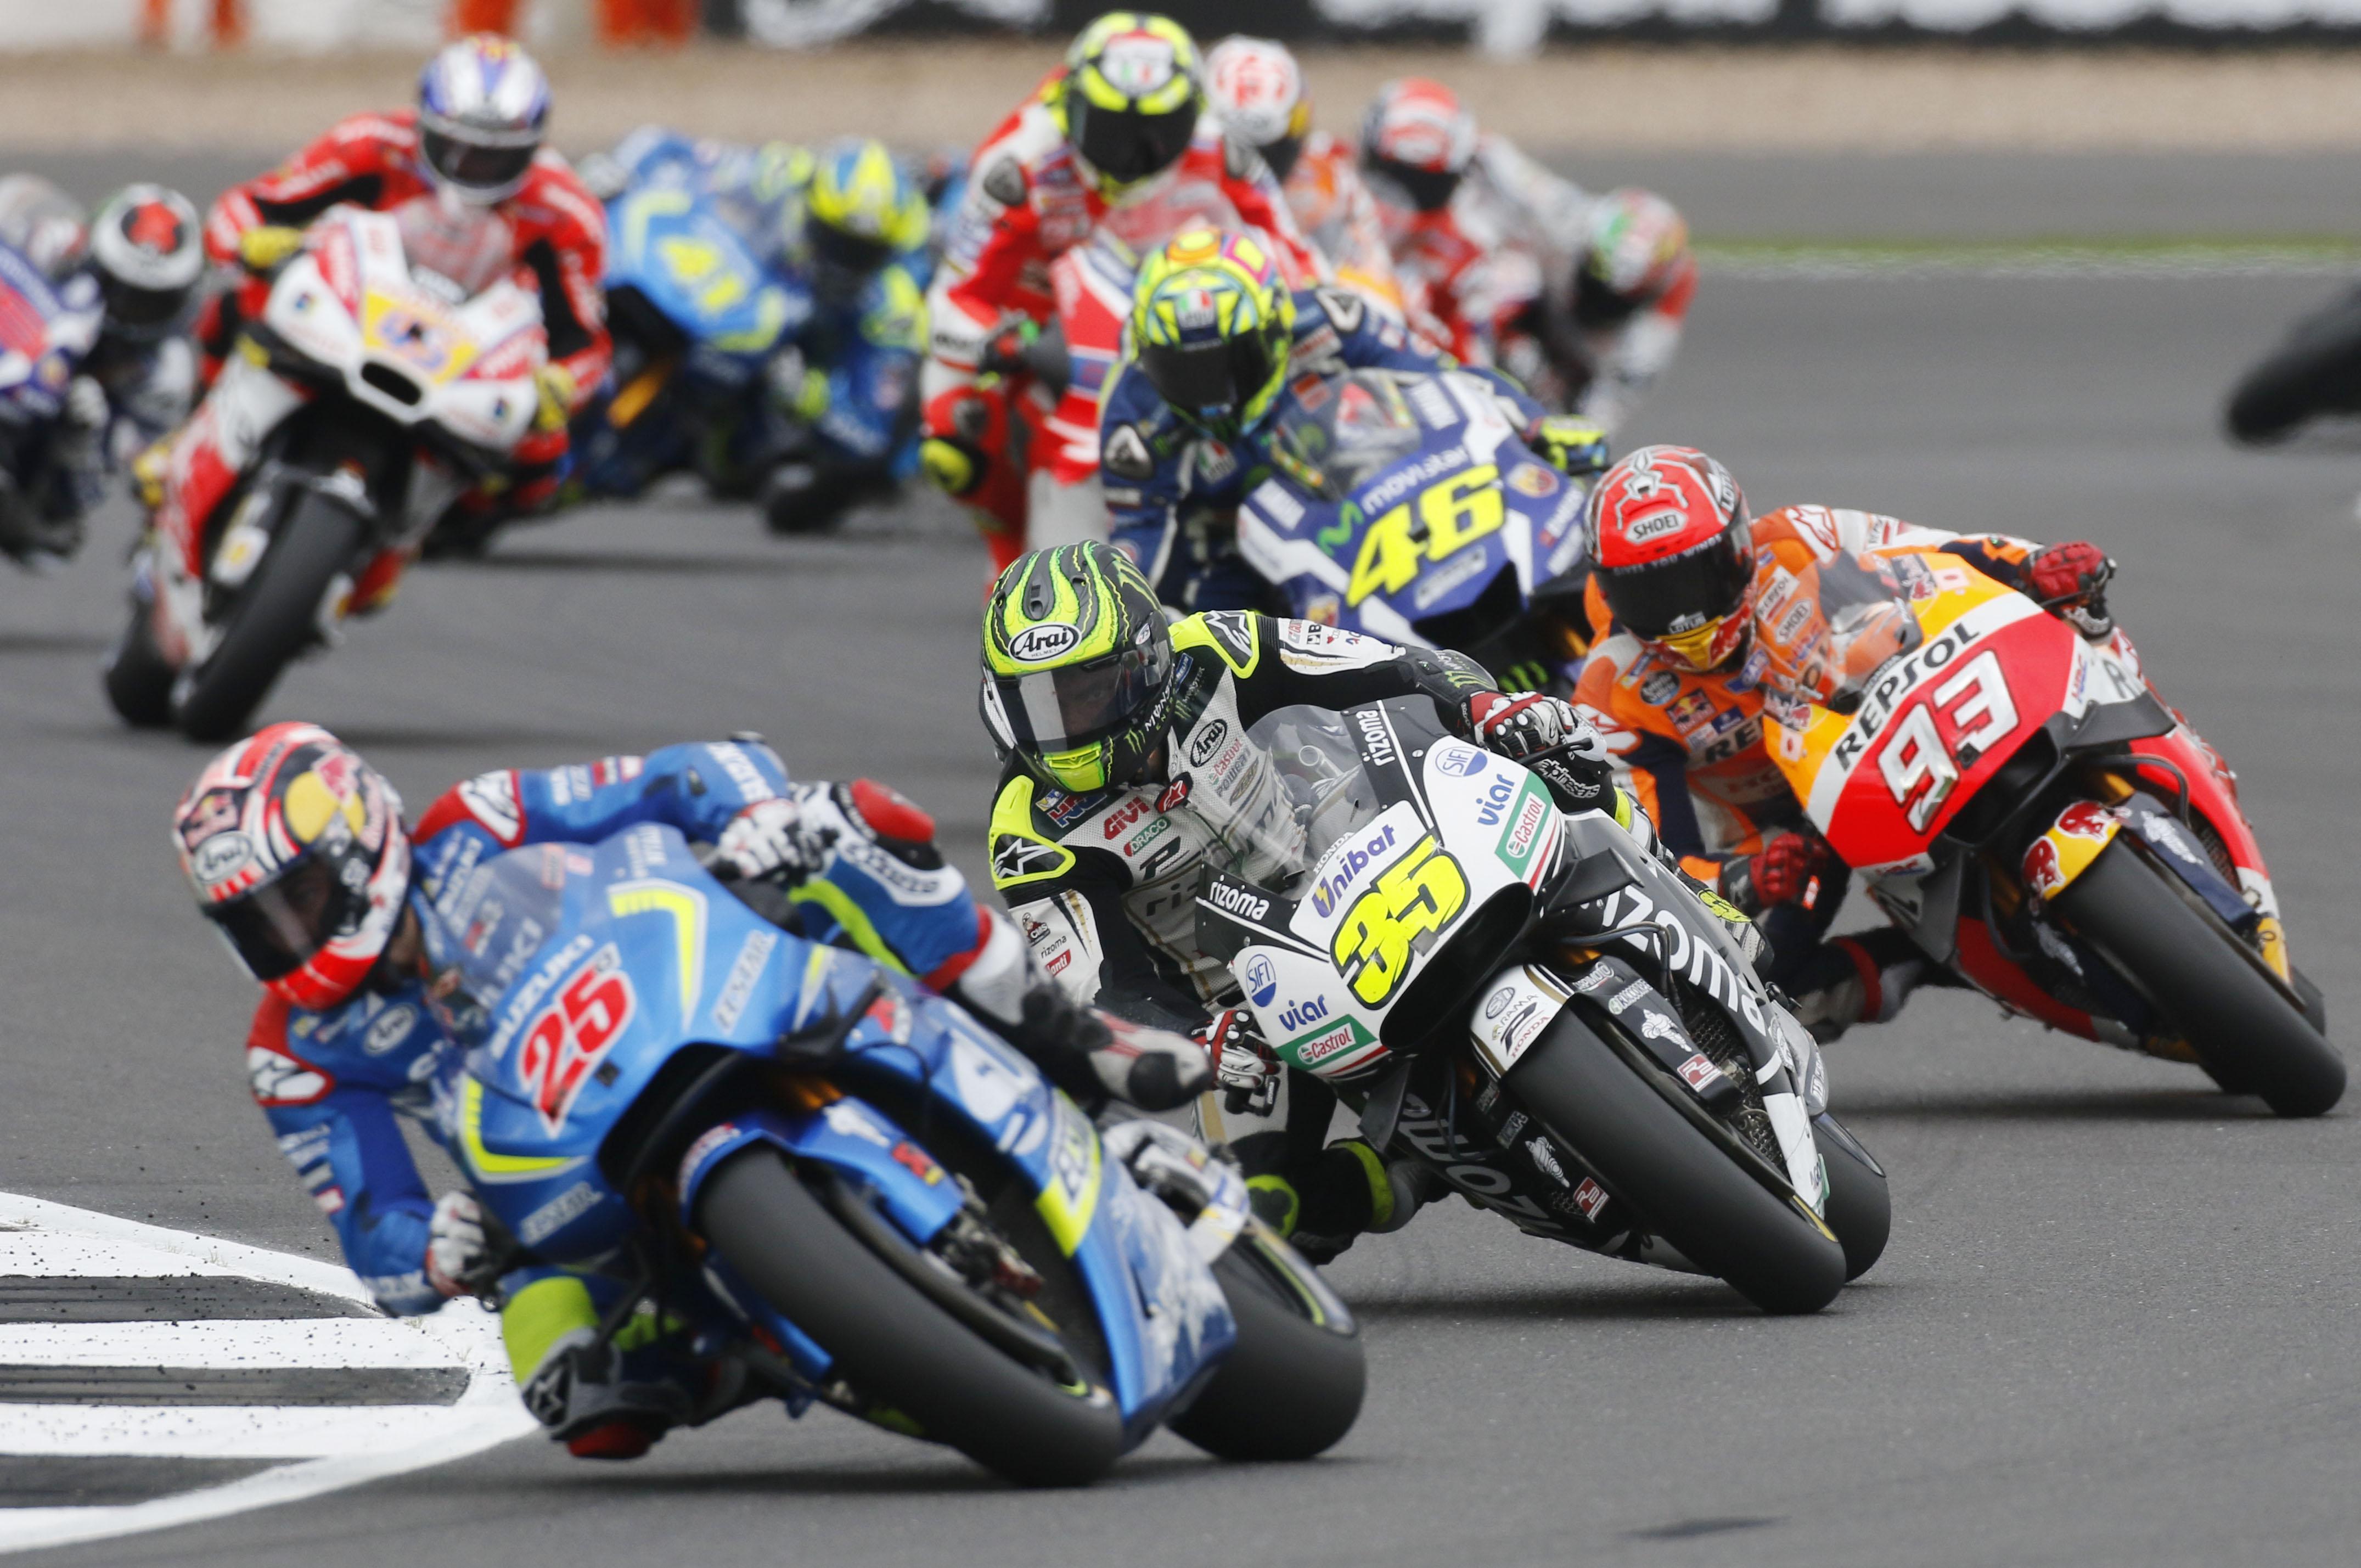 MotoGP has turned upside down | Motor Sport Magazine